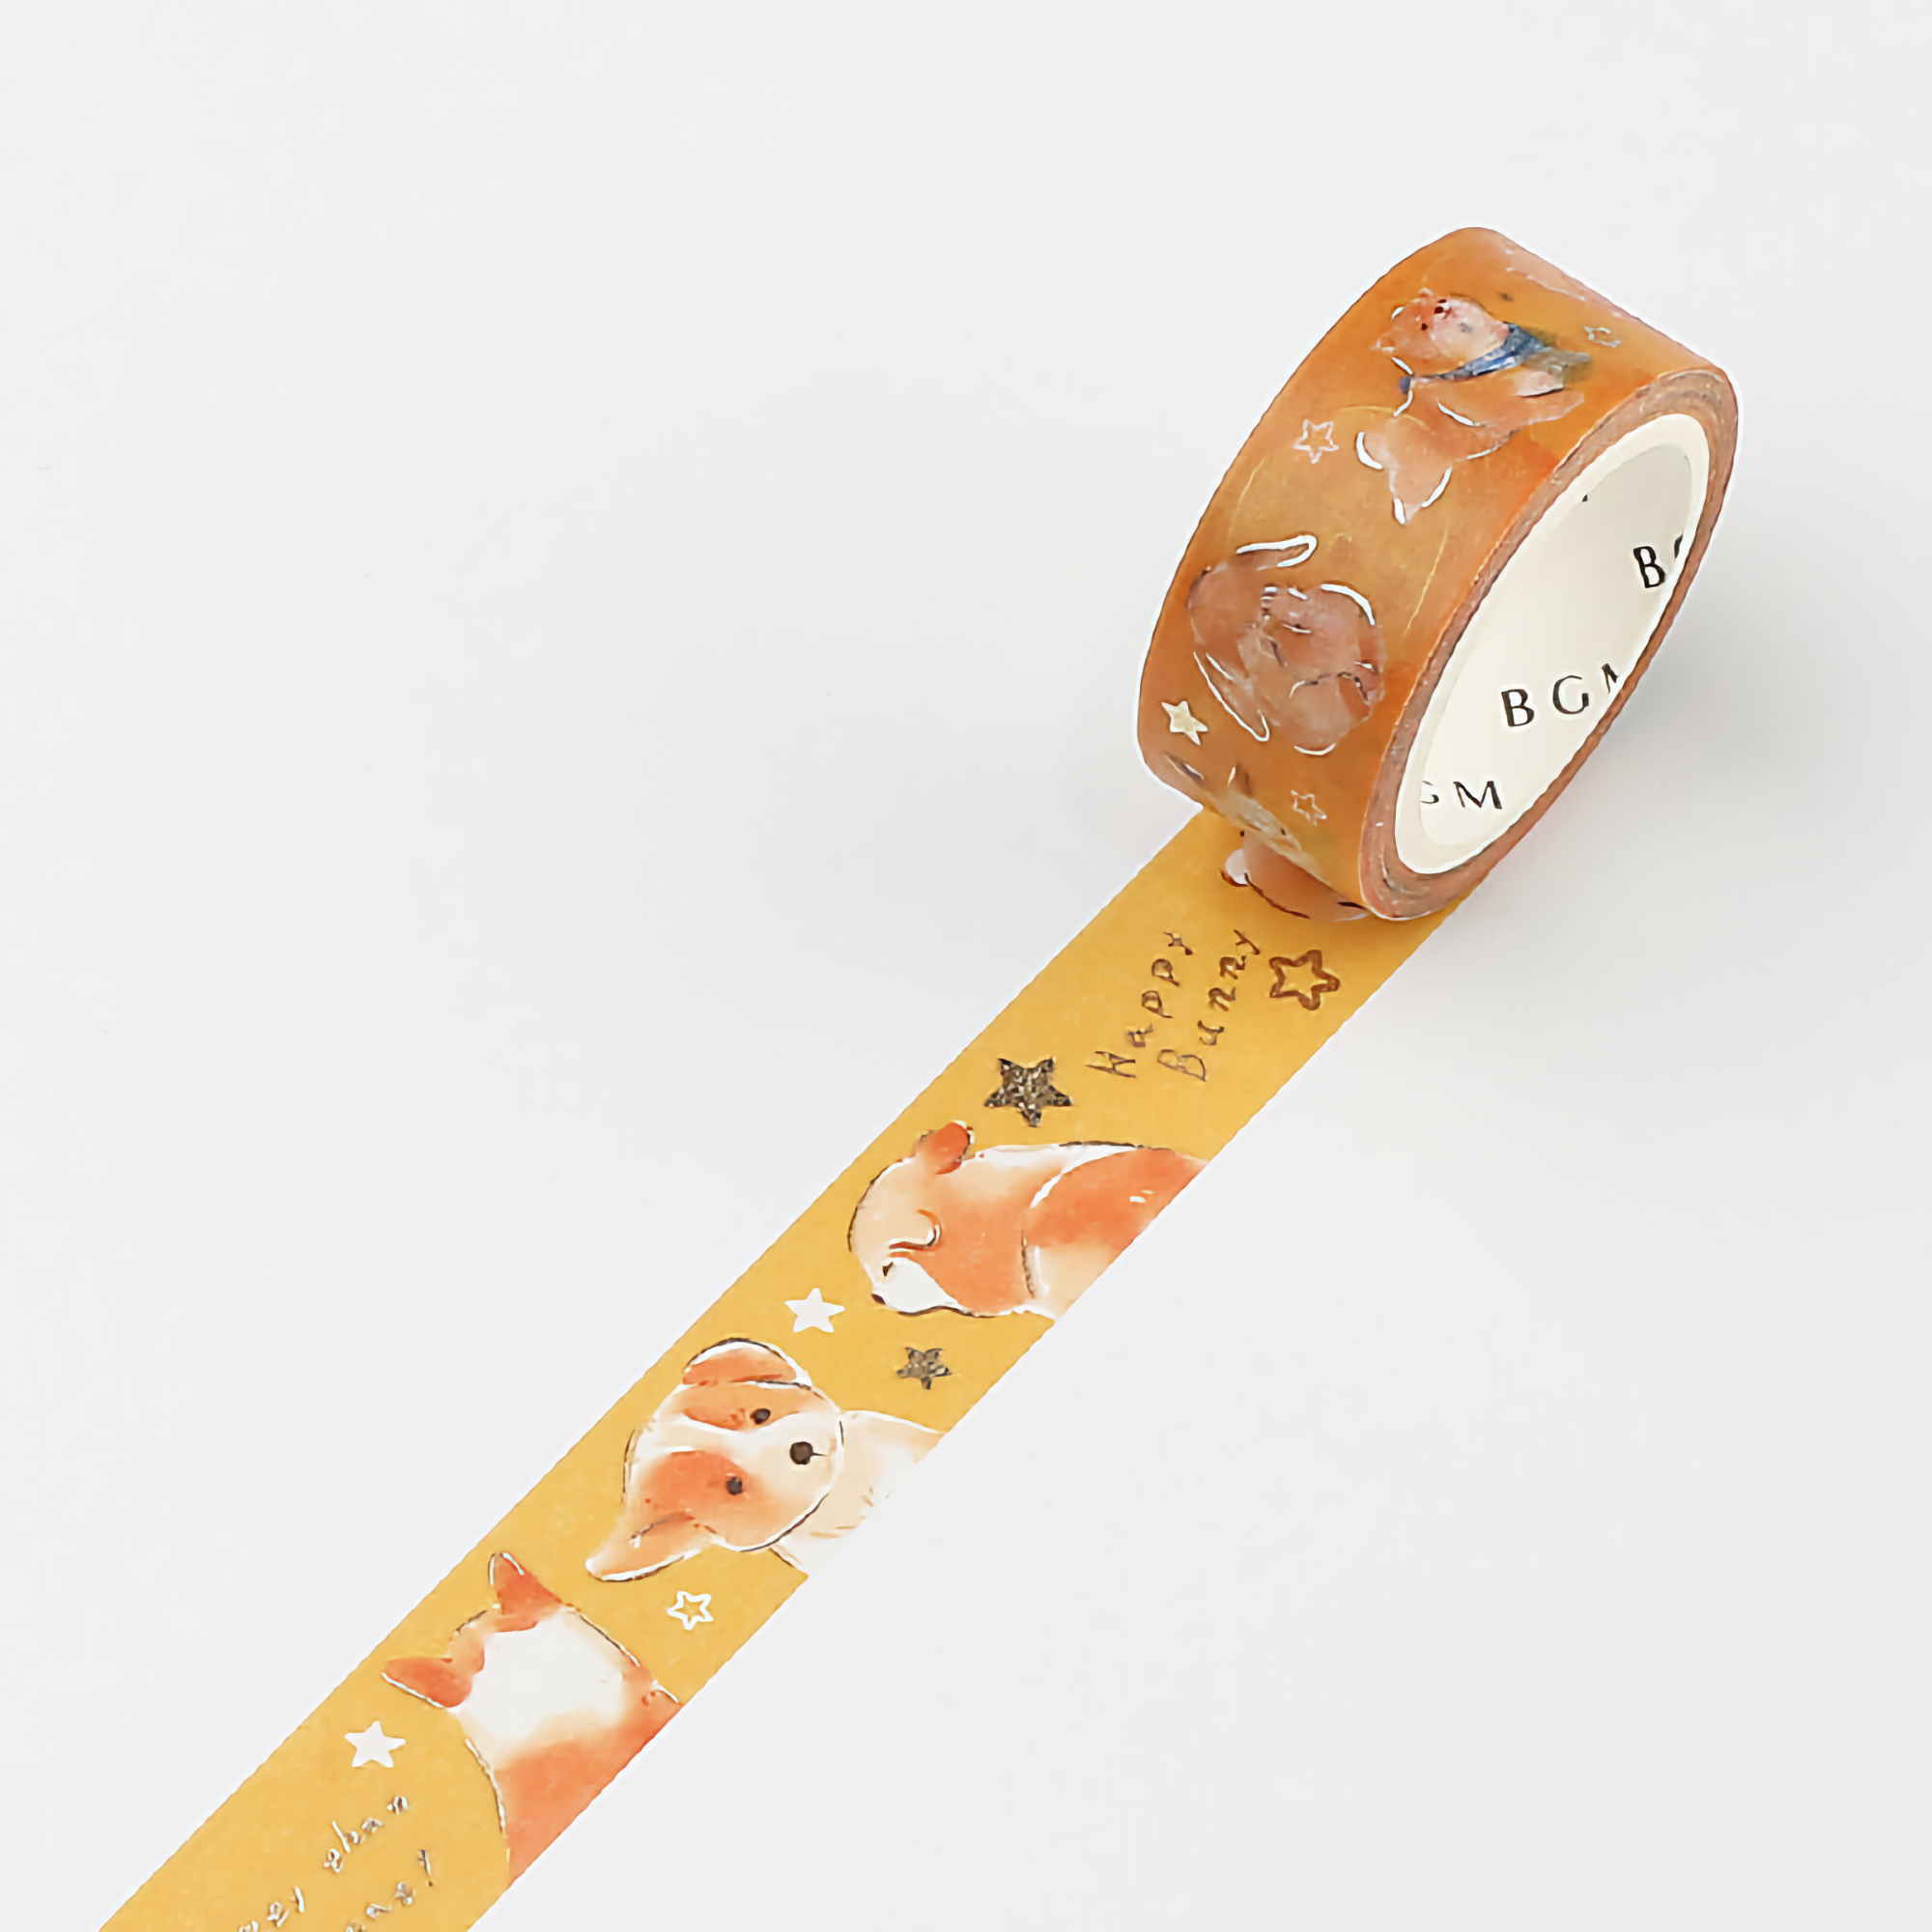 BGM Washi Tape Pet 15 mm